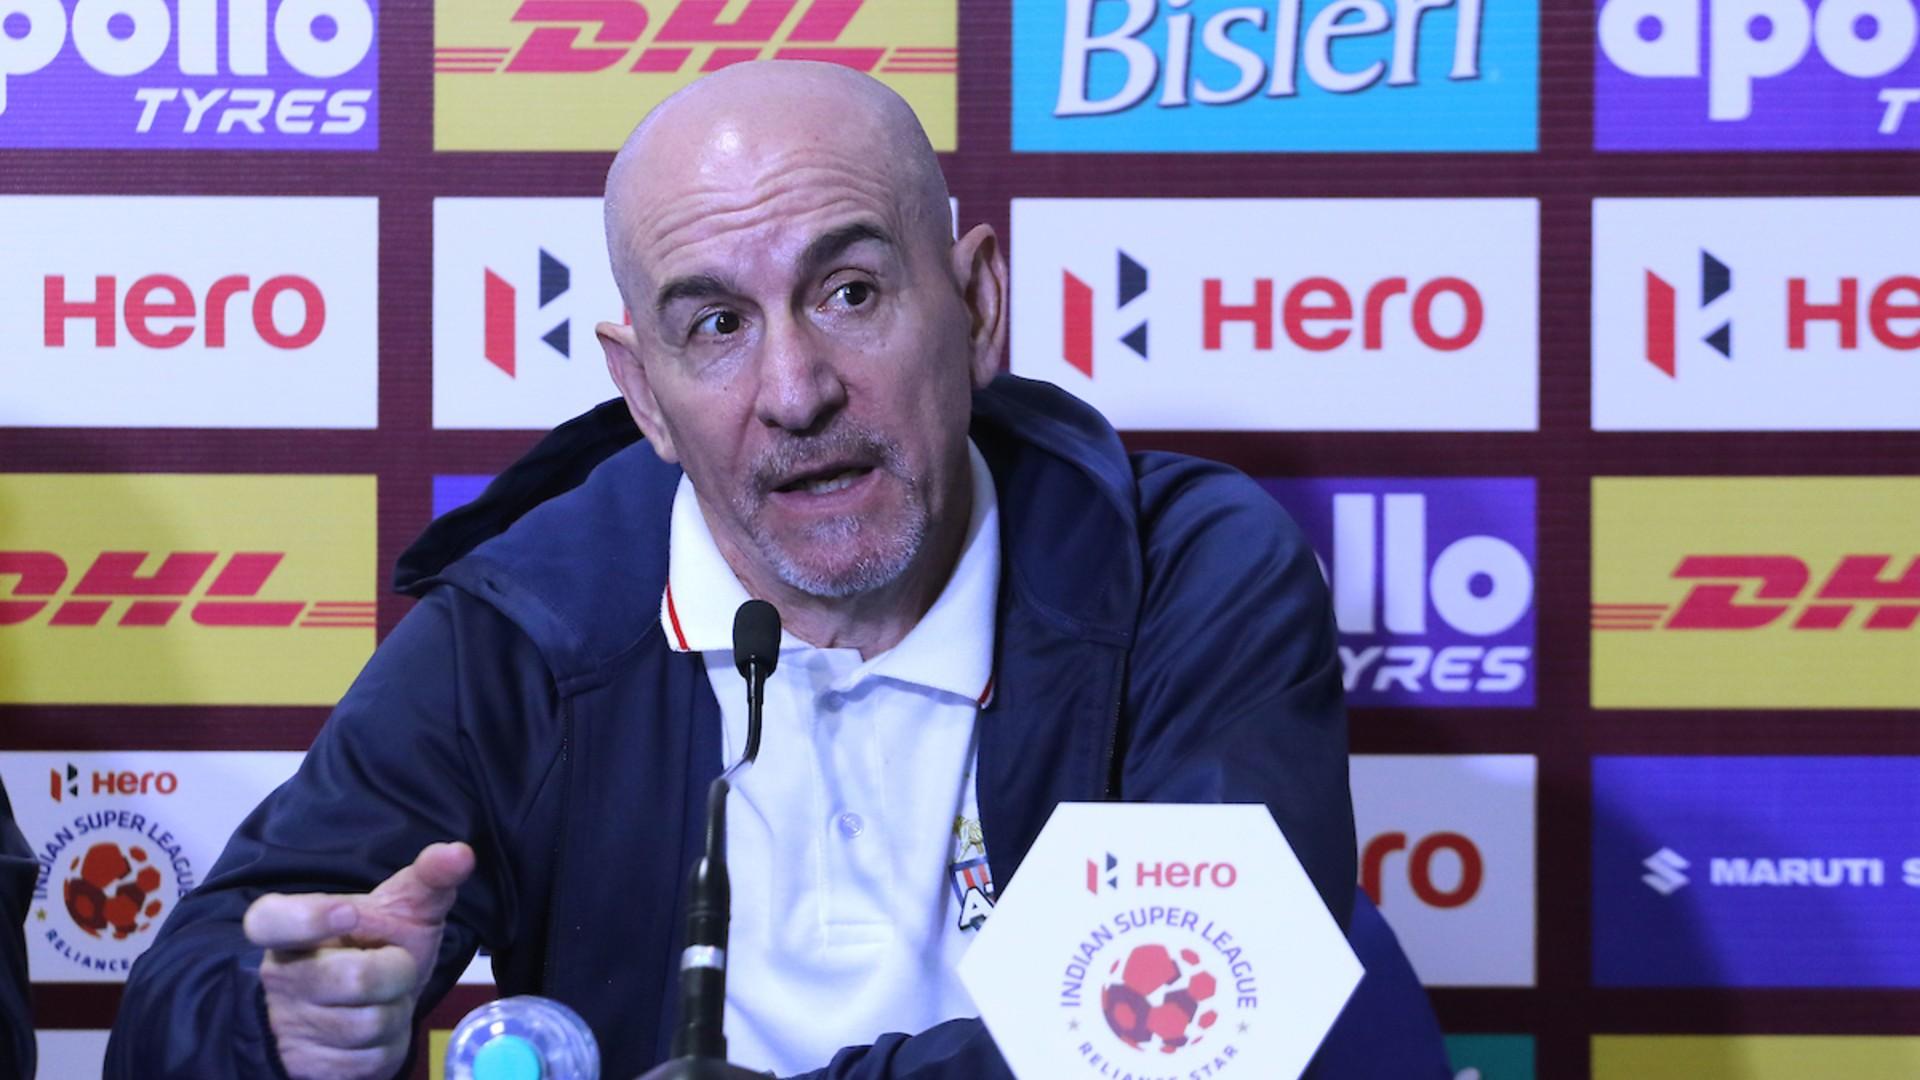 ATK's Antonio Lopez Habas - David Williams doubtful against Kerala Blasters